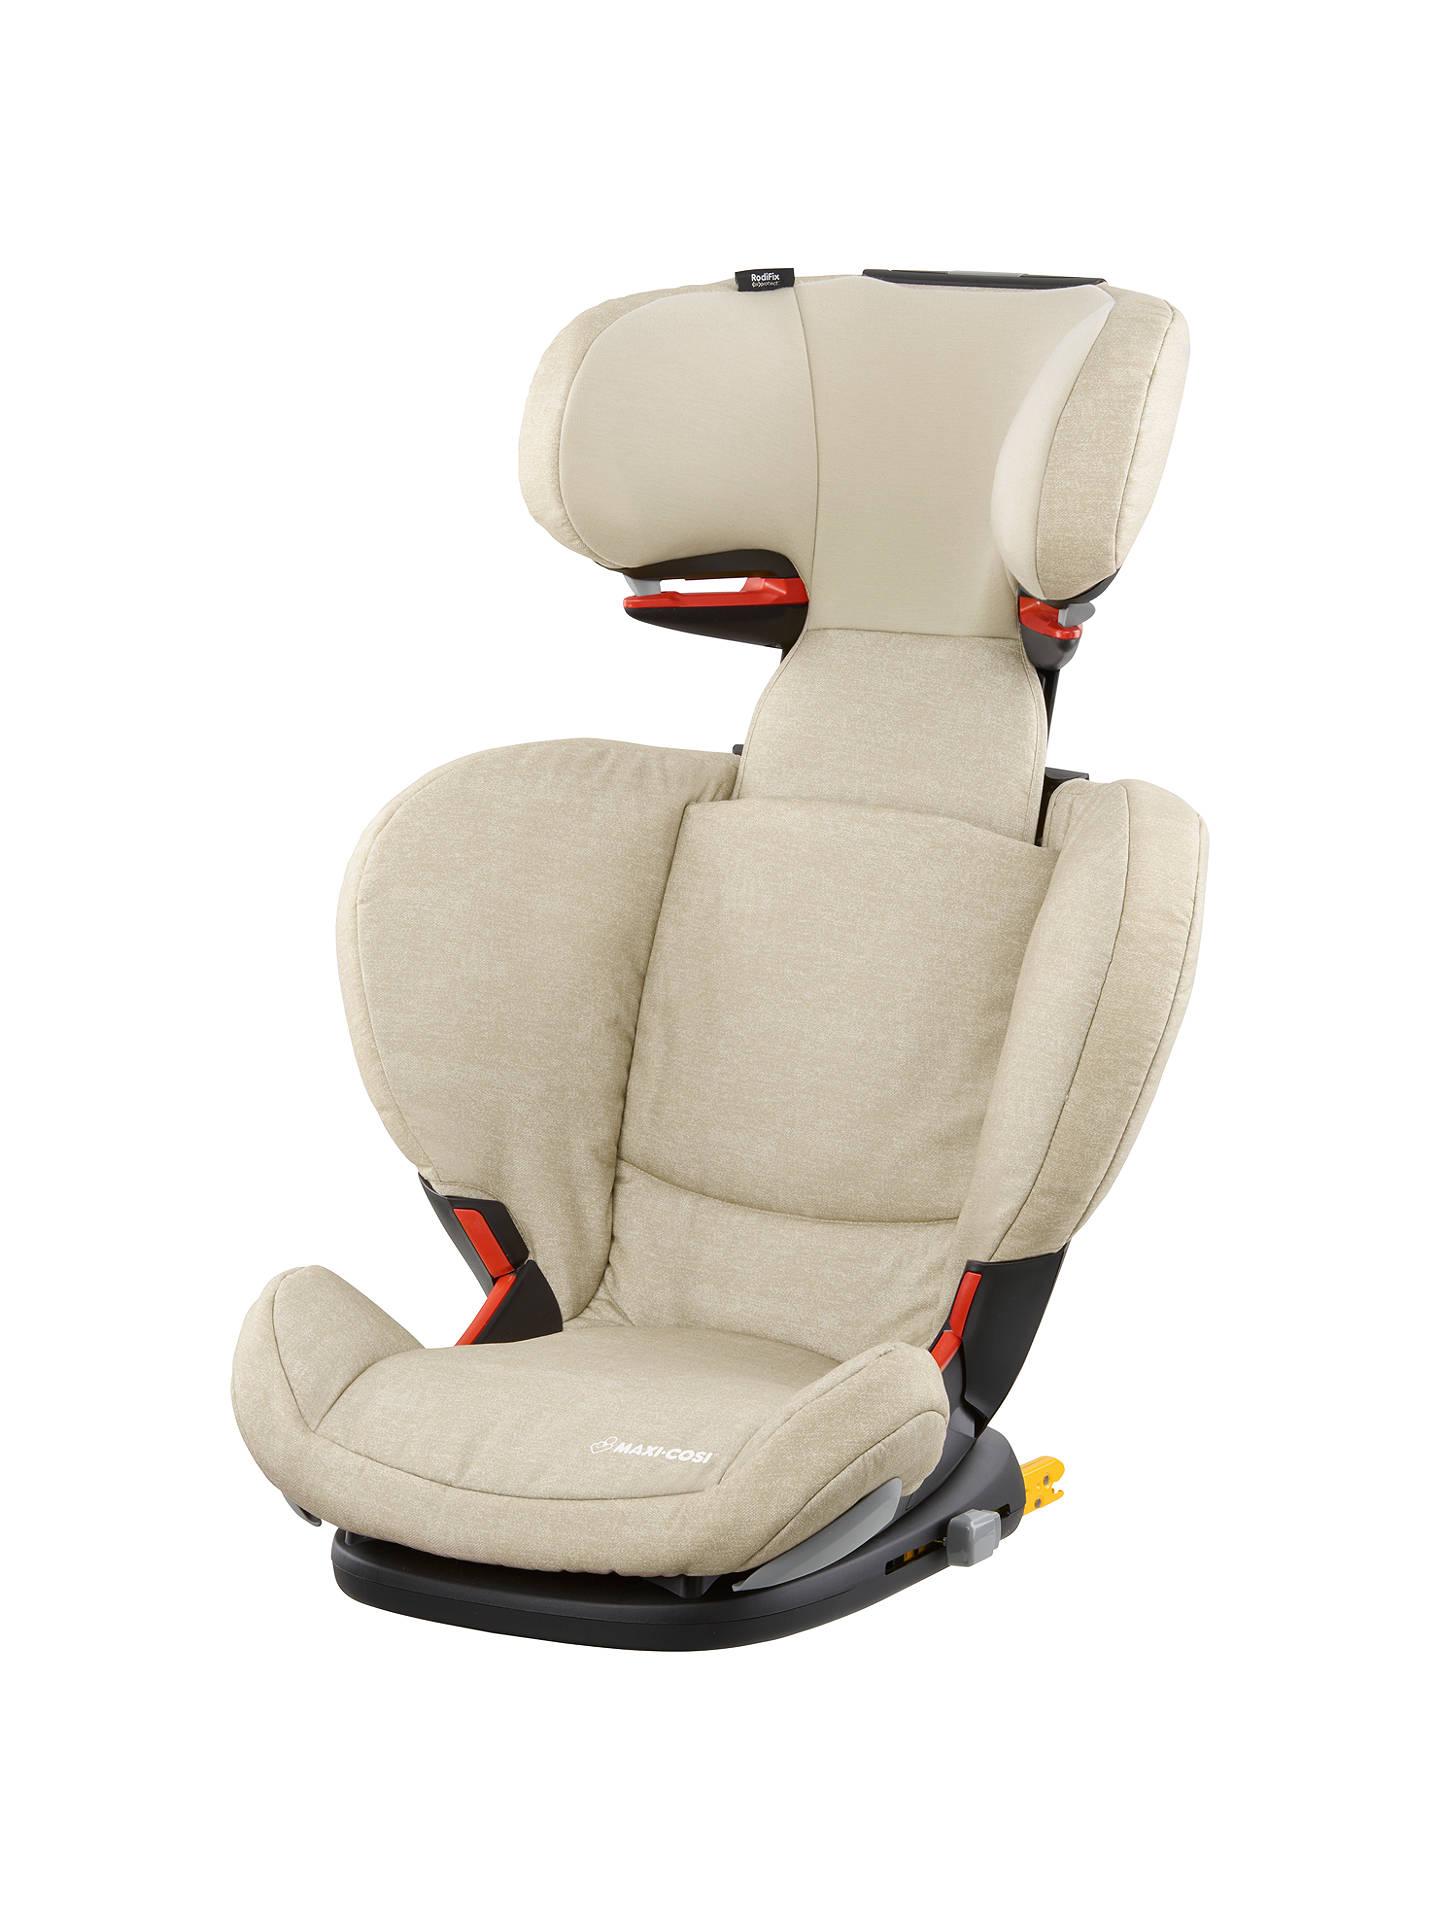 maxi cosi rodifix air protect group 2 3 car seat beige at. Black Bedroom Furniture Sets. Home Design Ideas